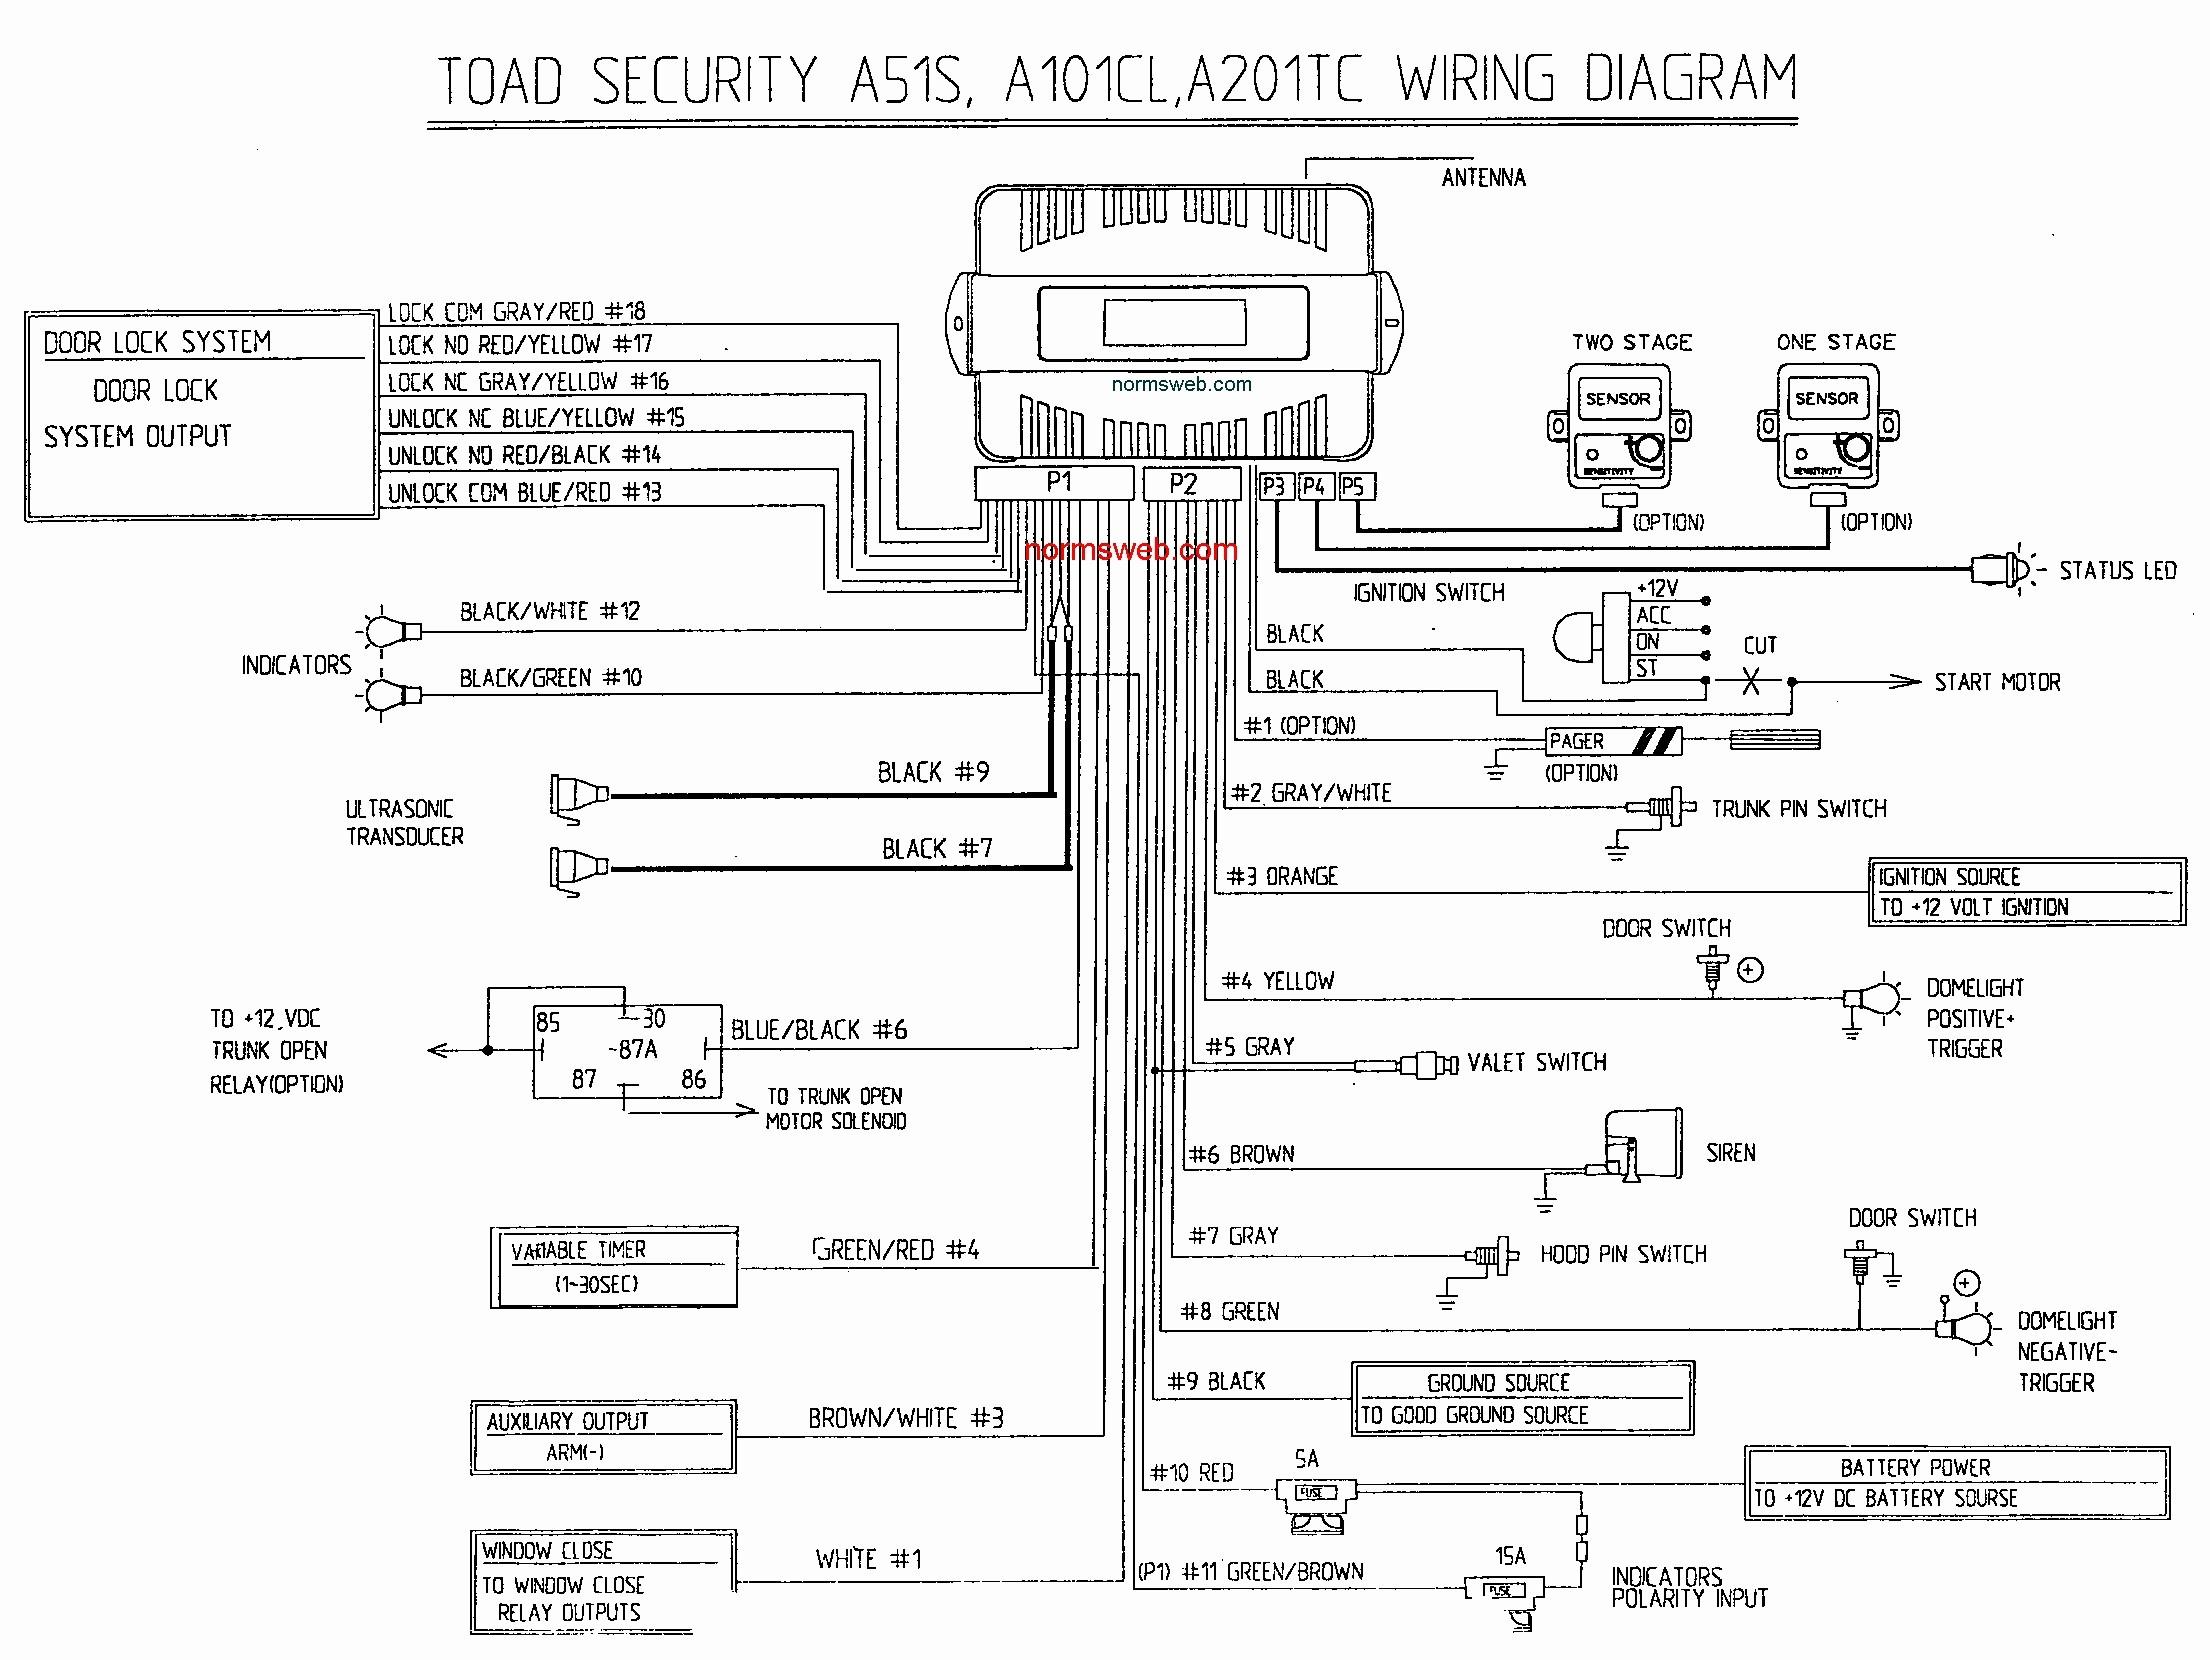 bulldog deluxe 500 wiring diagram antique reel winch schematic stone tr34r description auto meter diagrams for